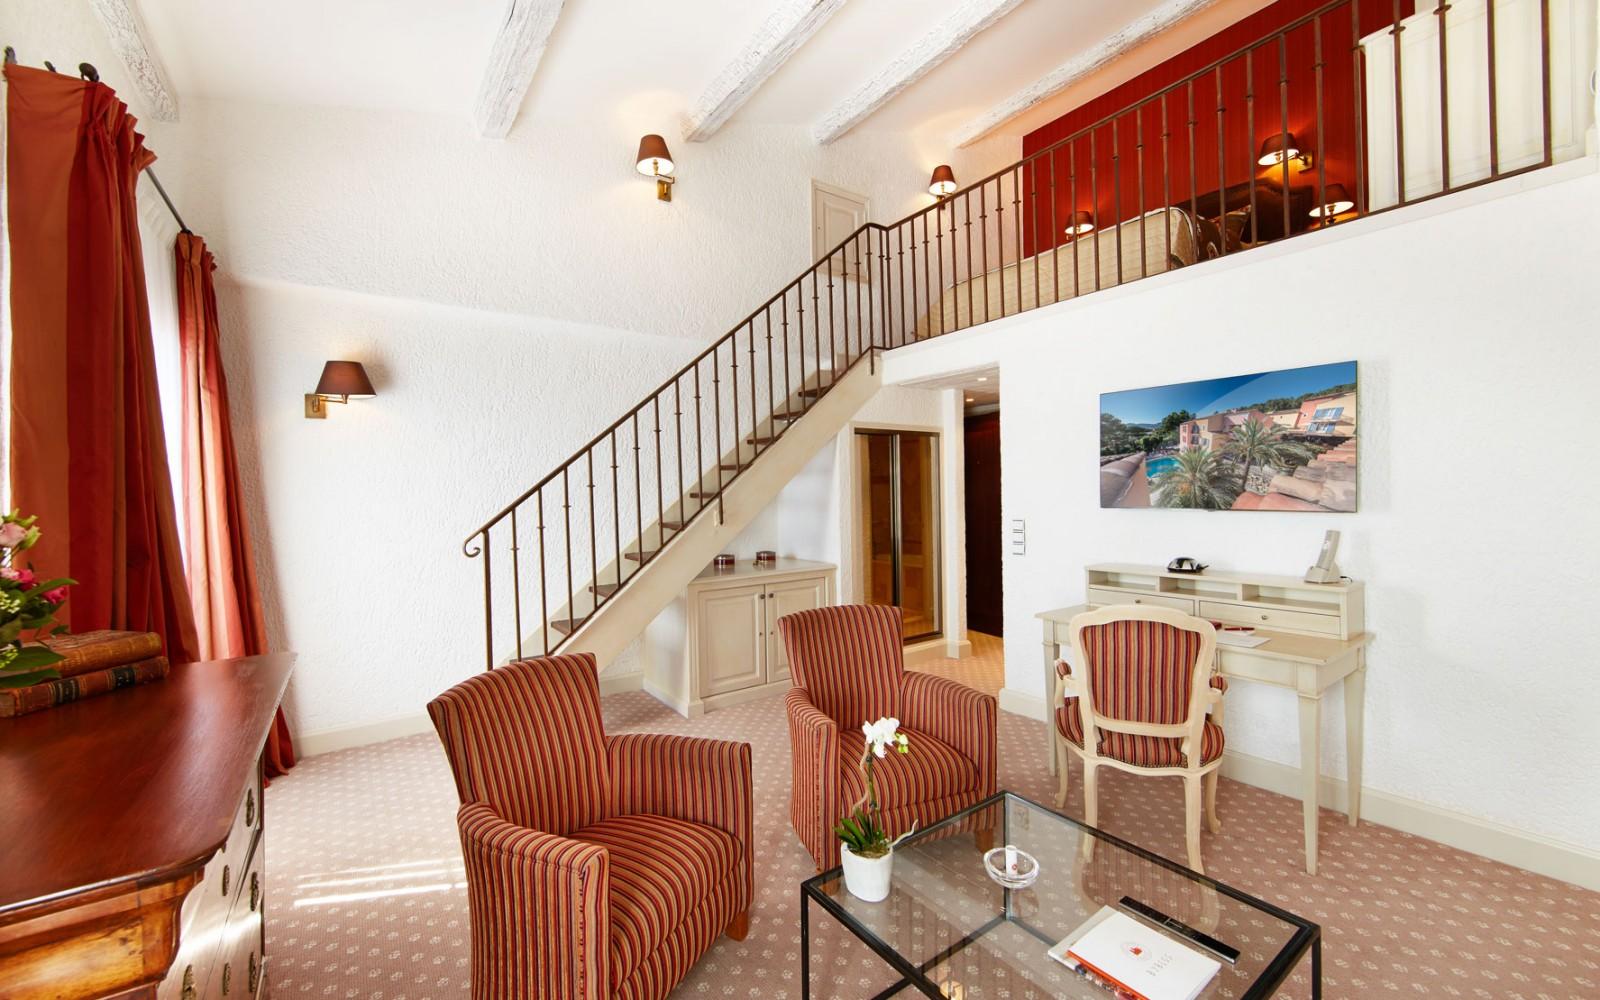 Hotel_Byblos_Saint-Tropez_Duplex-room-525-1